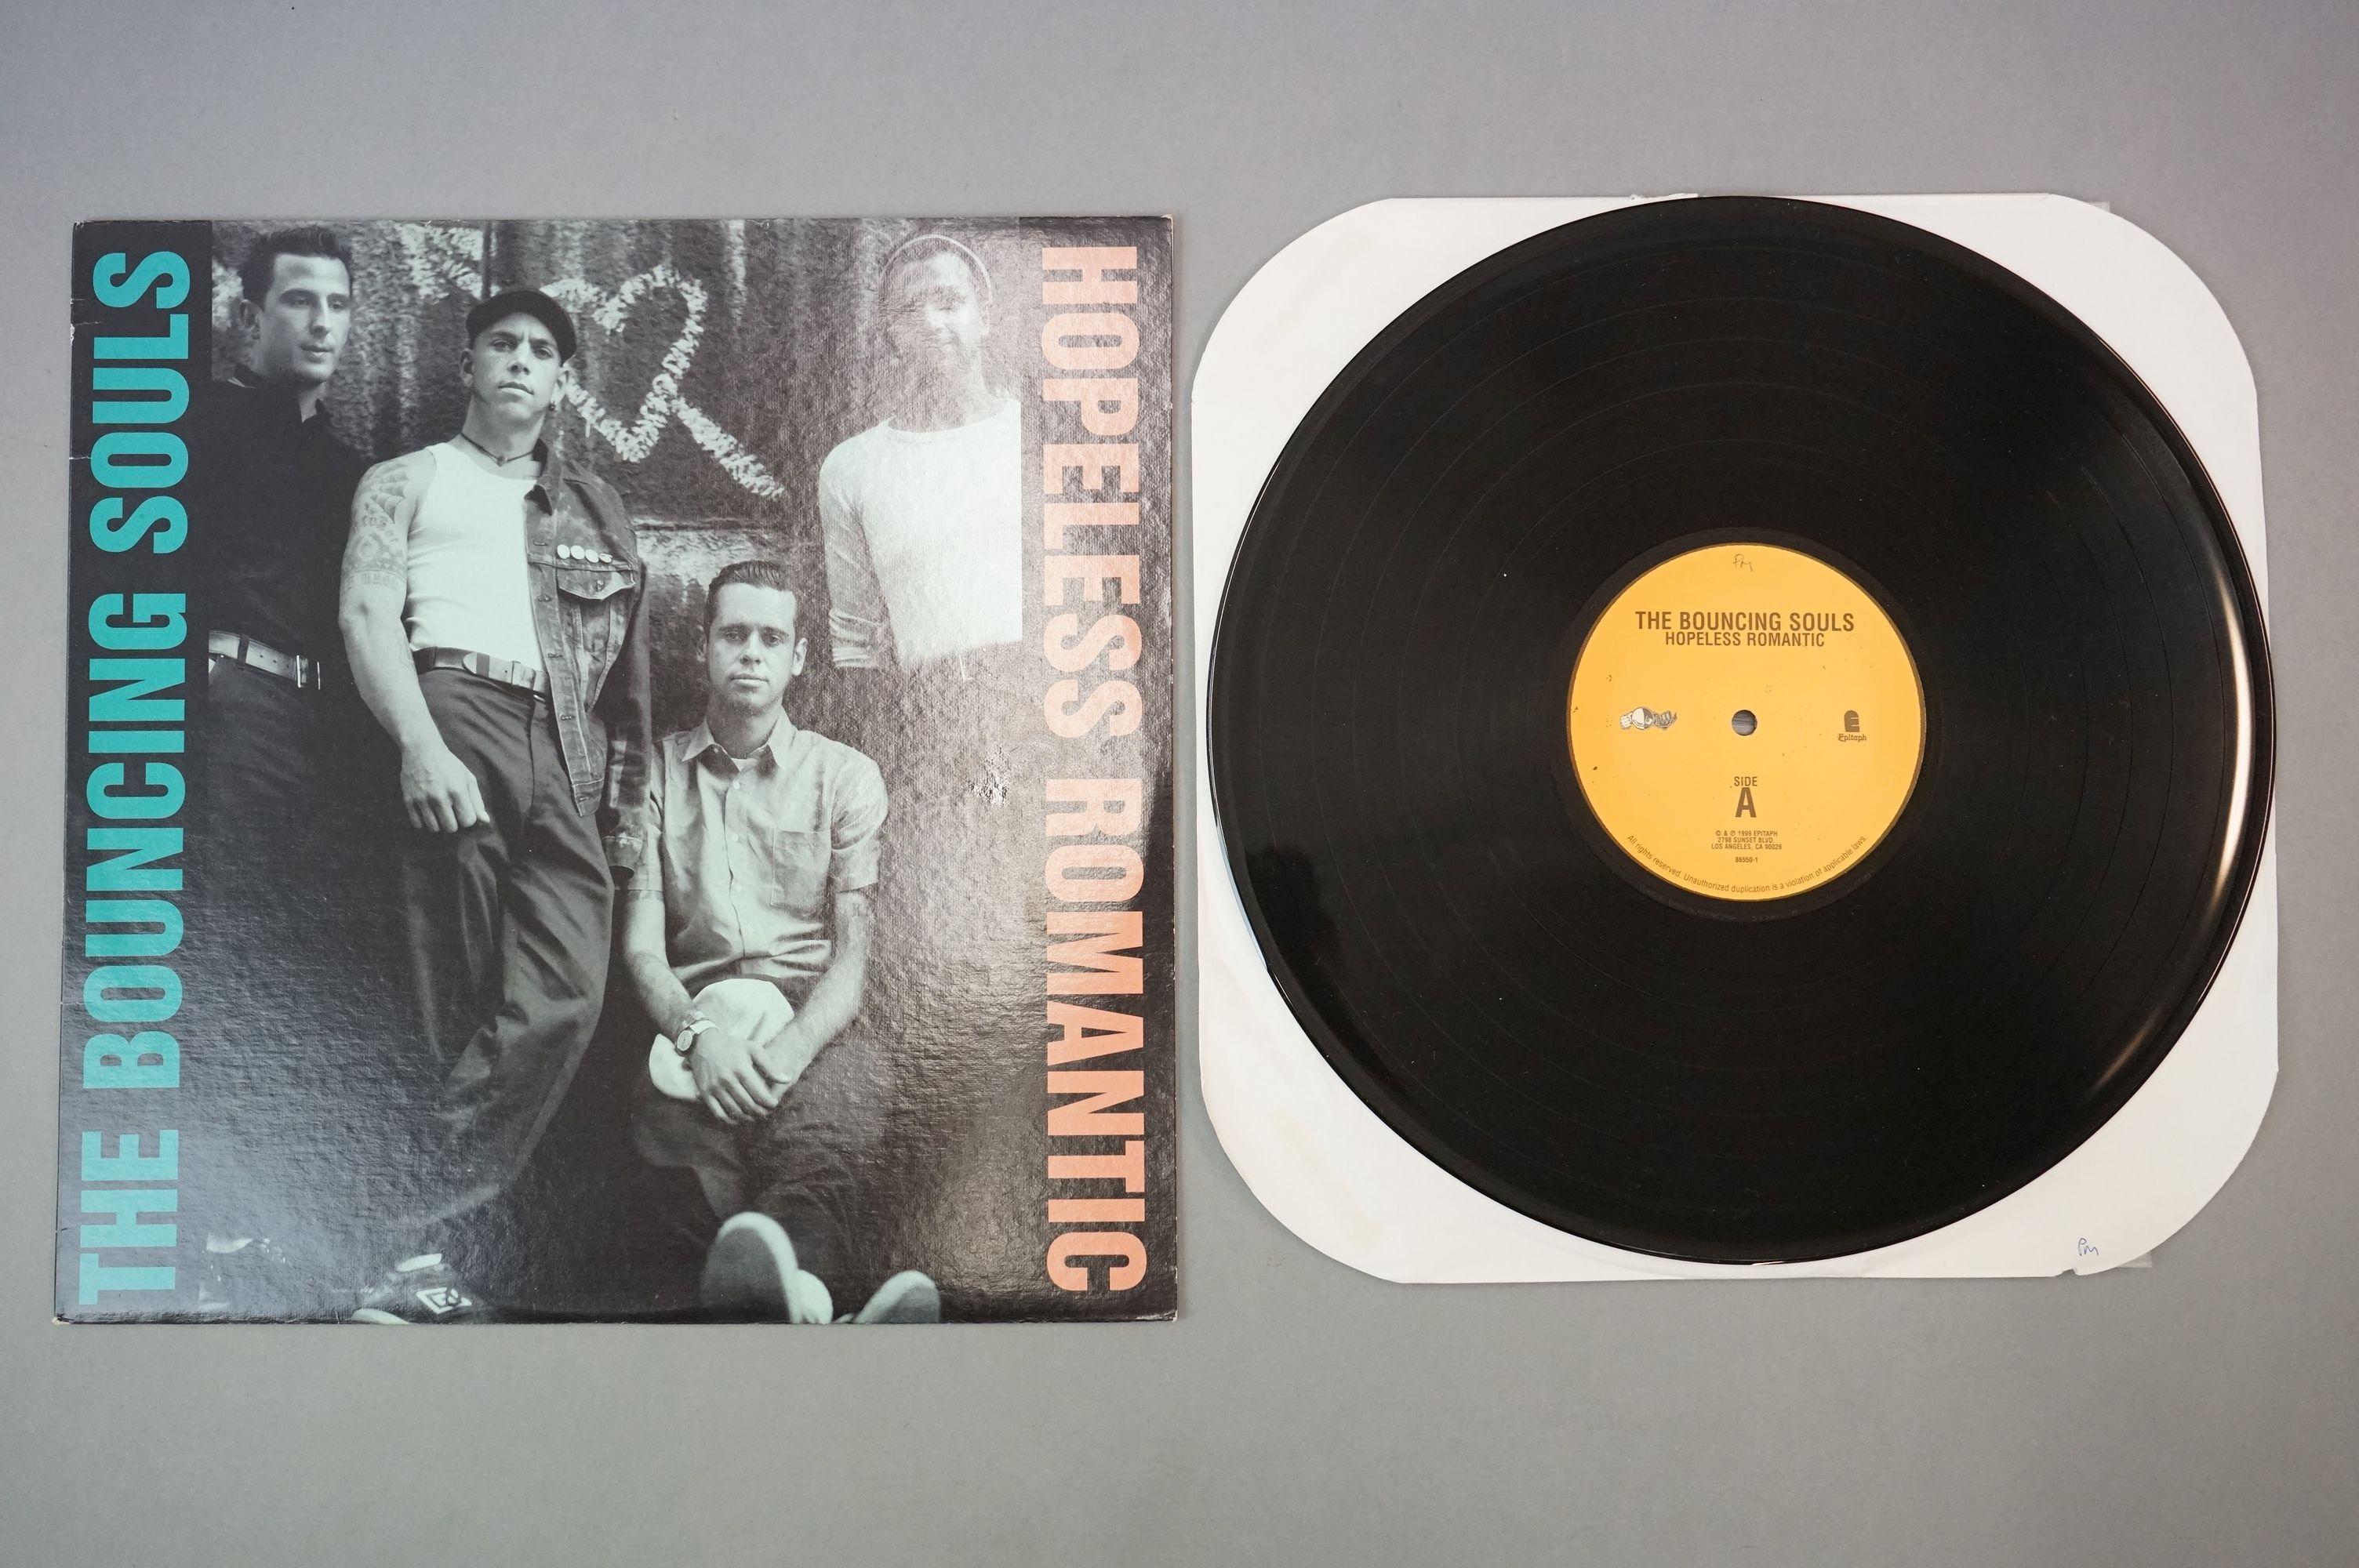 Vinyl - Fleetwood Mac, Kiln House (Reprise RSLP 9004) insert included, sleeve, insert and vinyl vg+ - Image 7 of 14